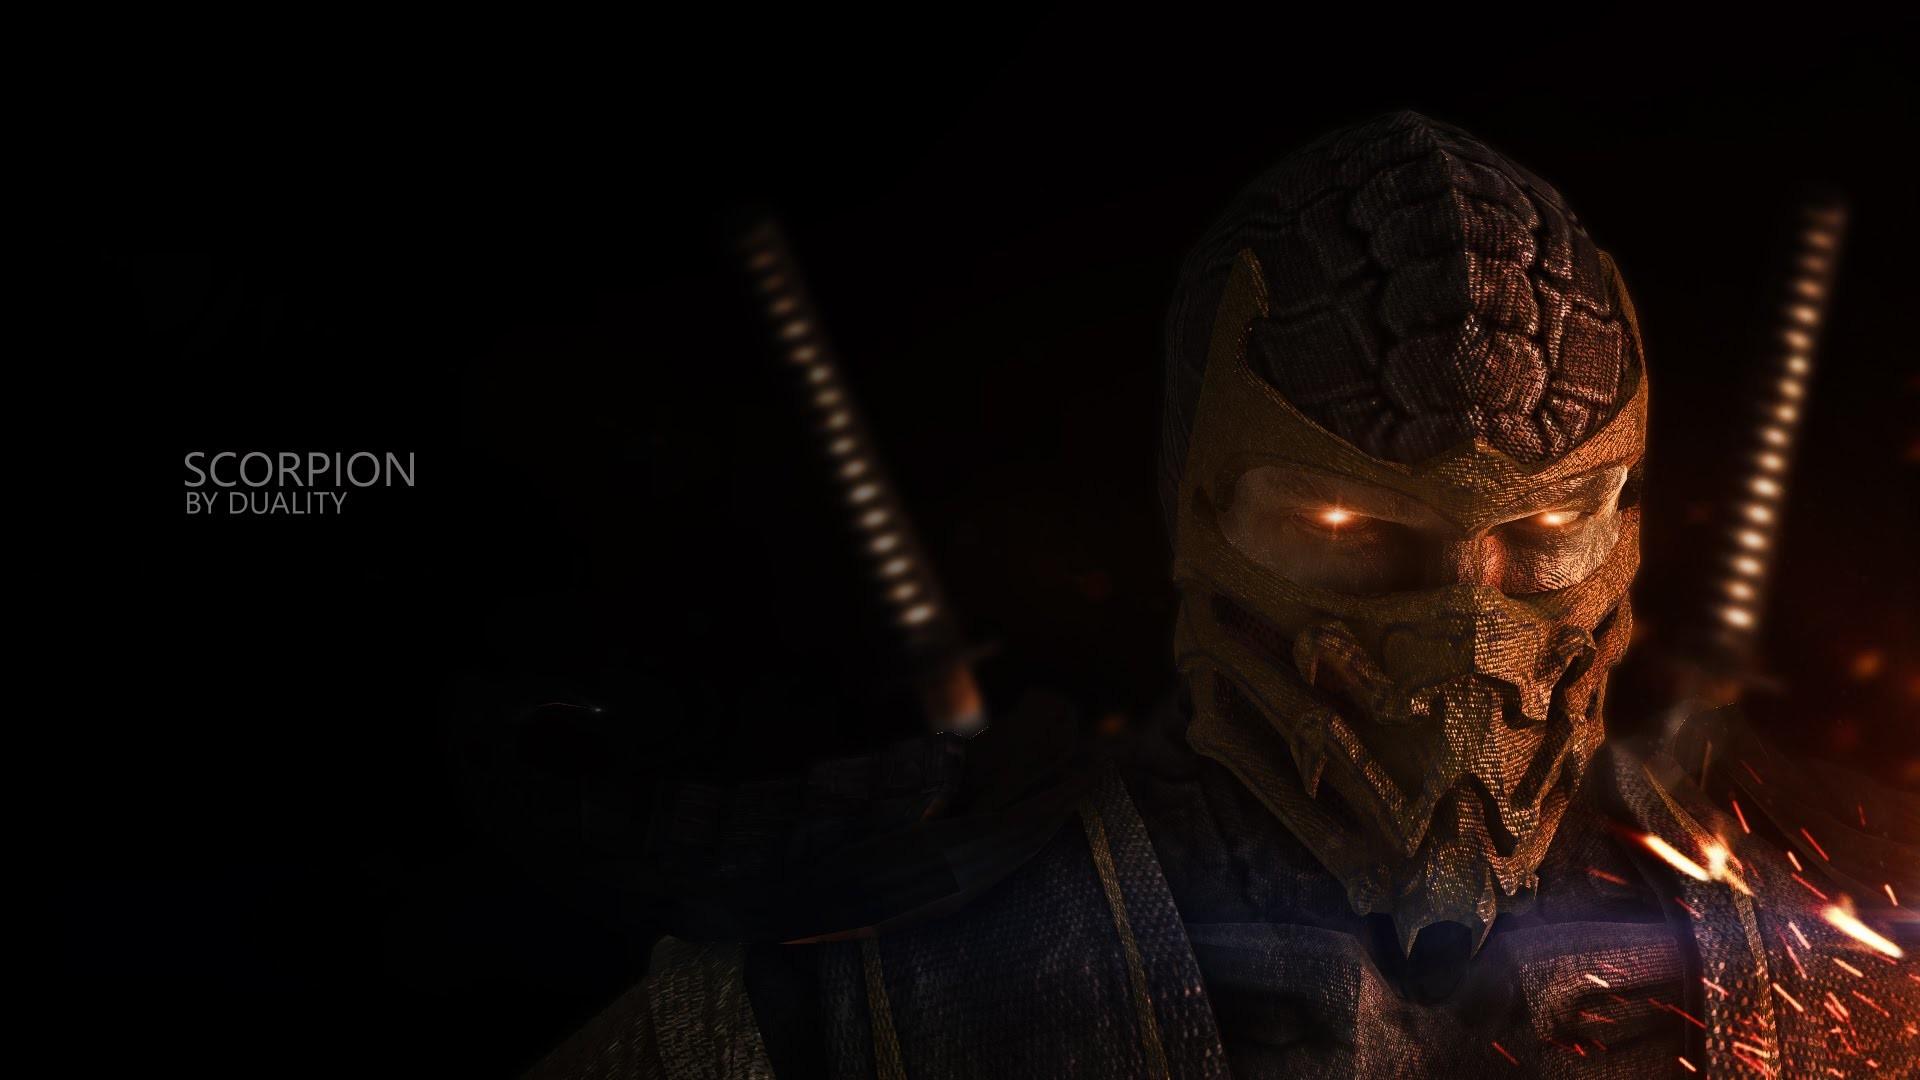 Mortal Kombat Wallpapers Scorpion ·① WallpaperTag